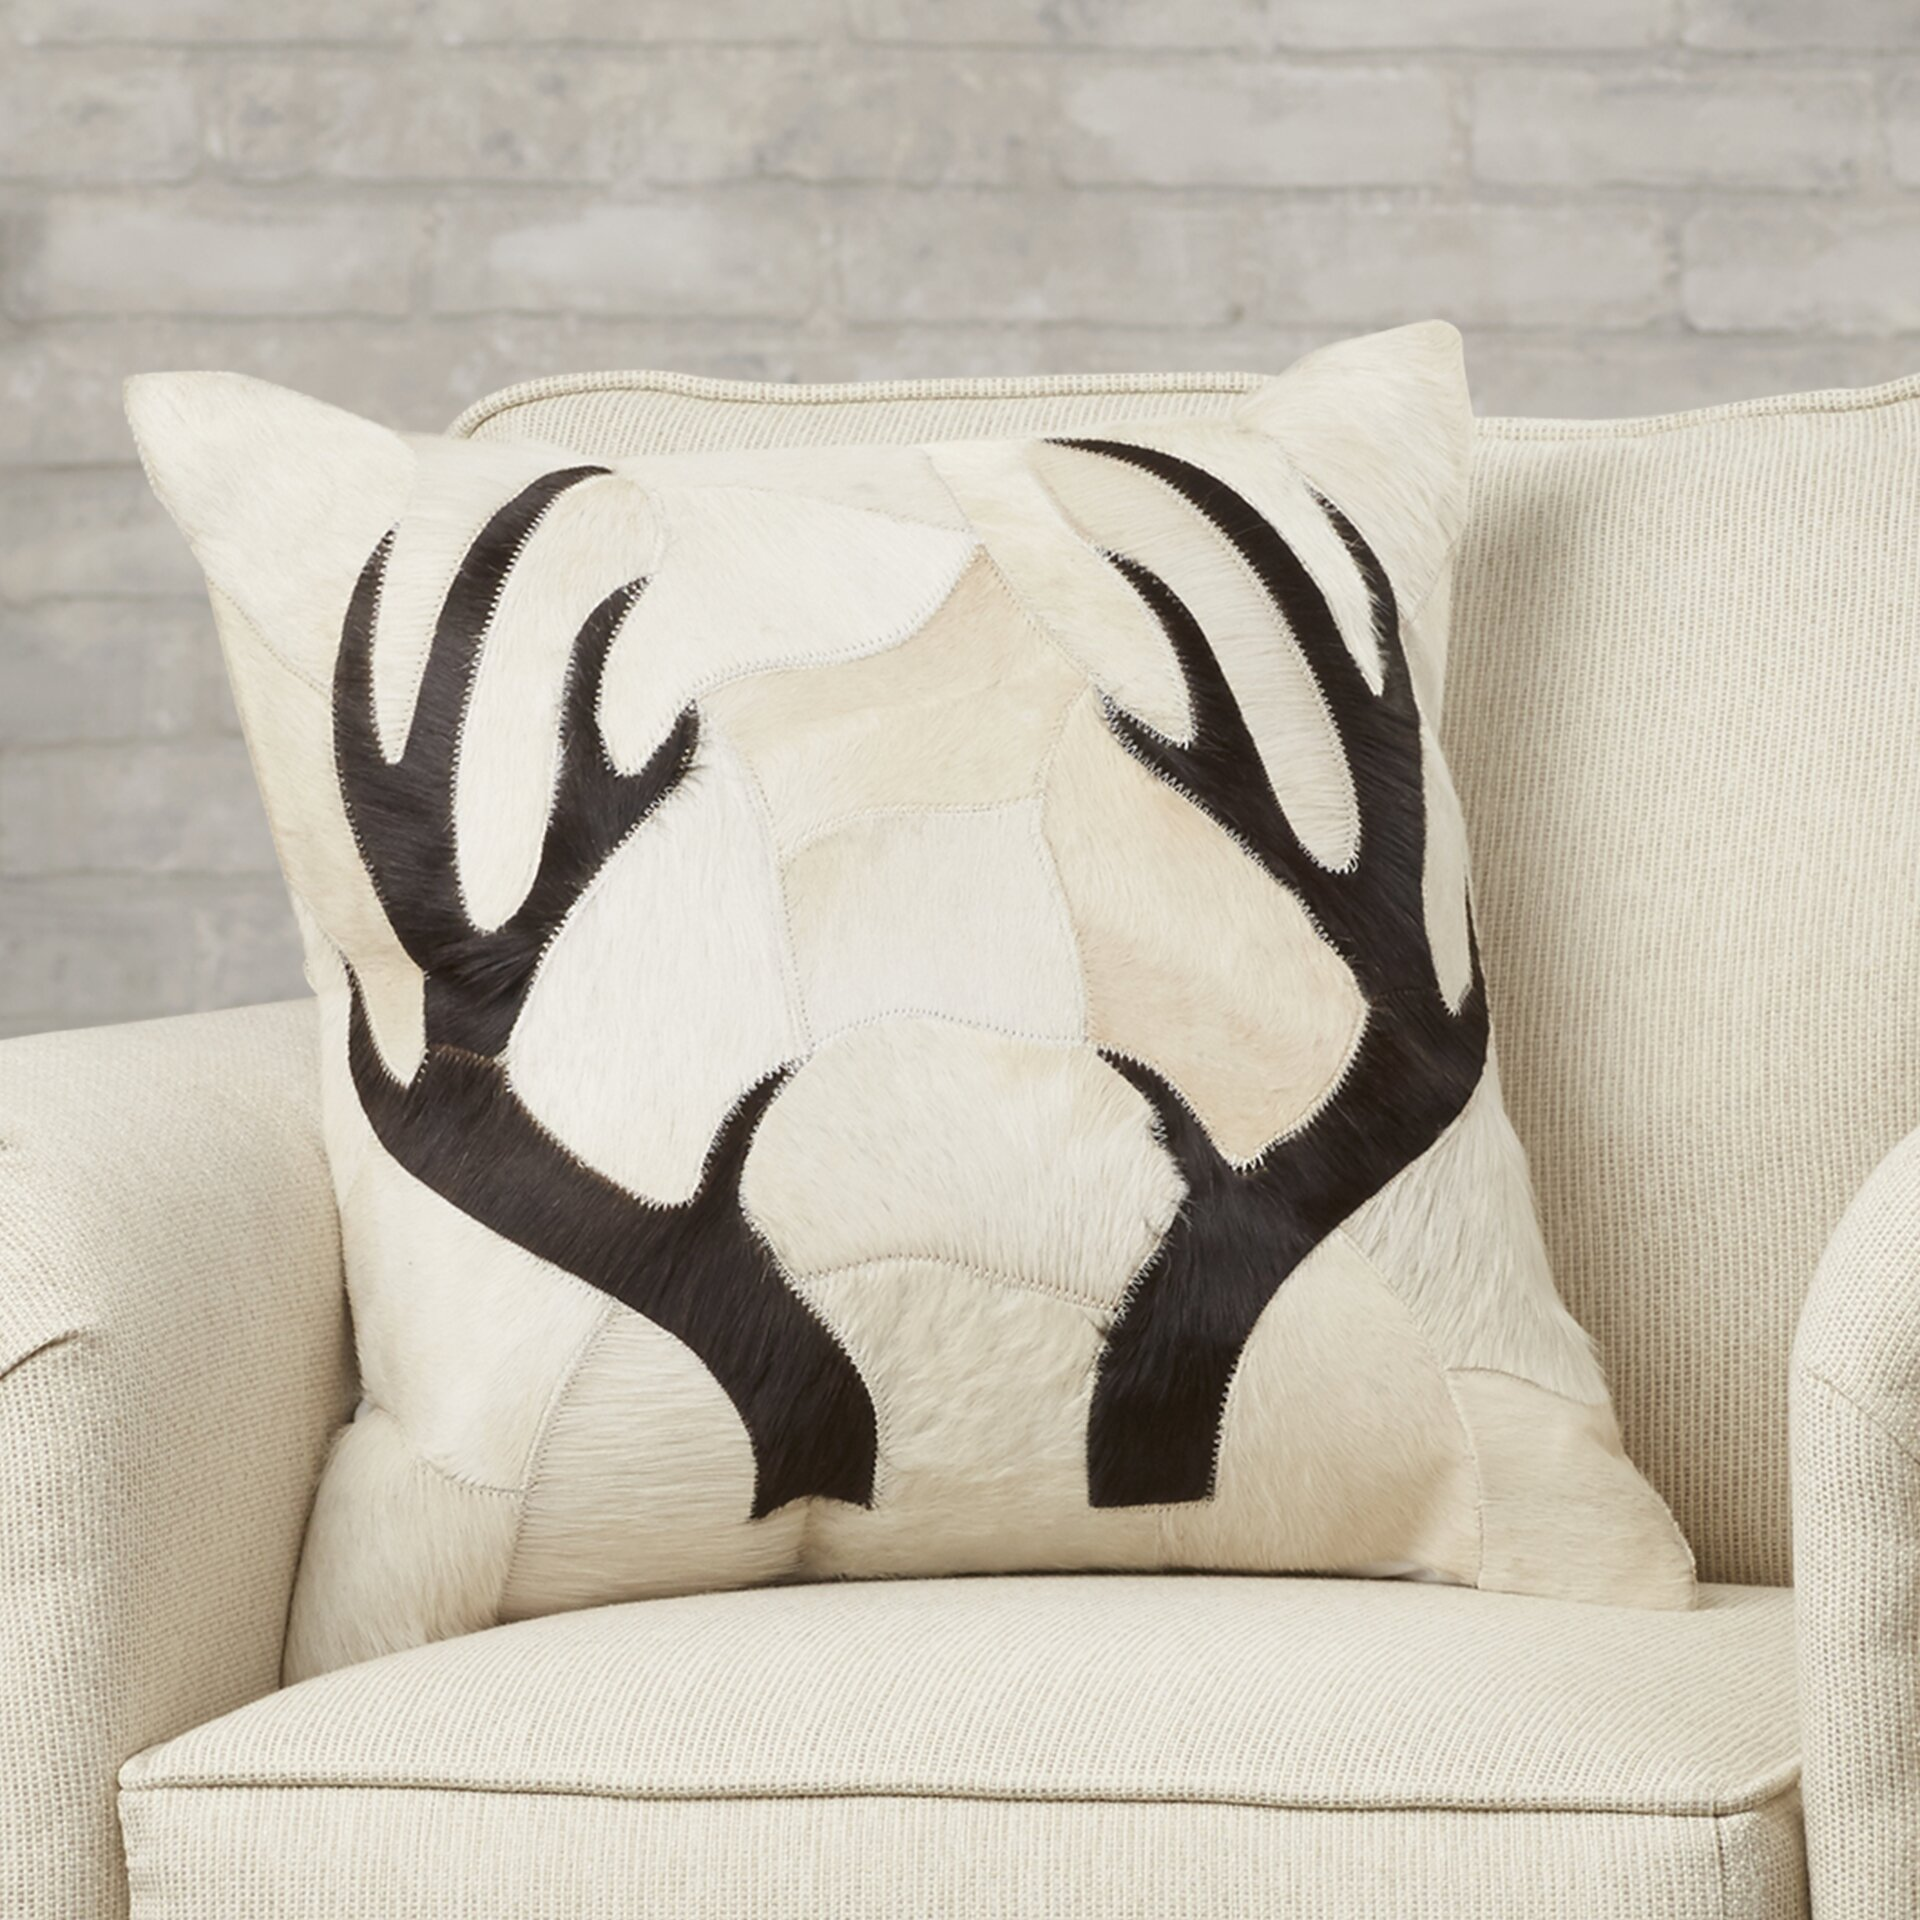 Antler Throw Pillow : Trent Austin Design Agate Antler Piecework Hide Throw Pillow & Reviews Wayfair